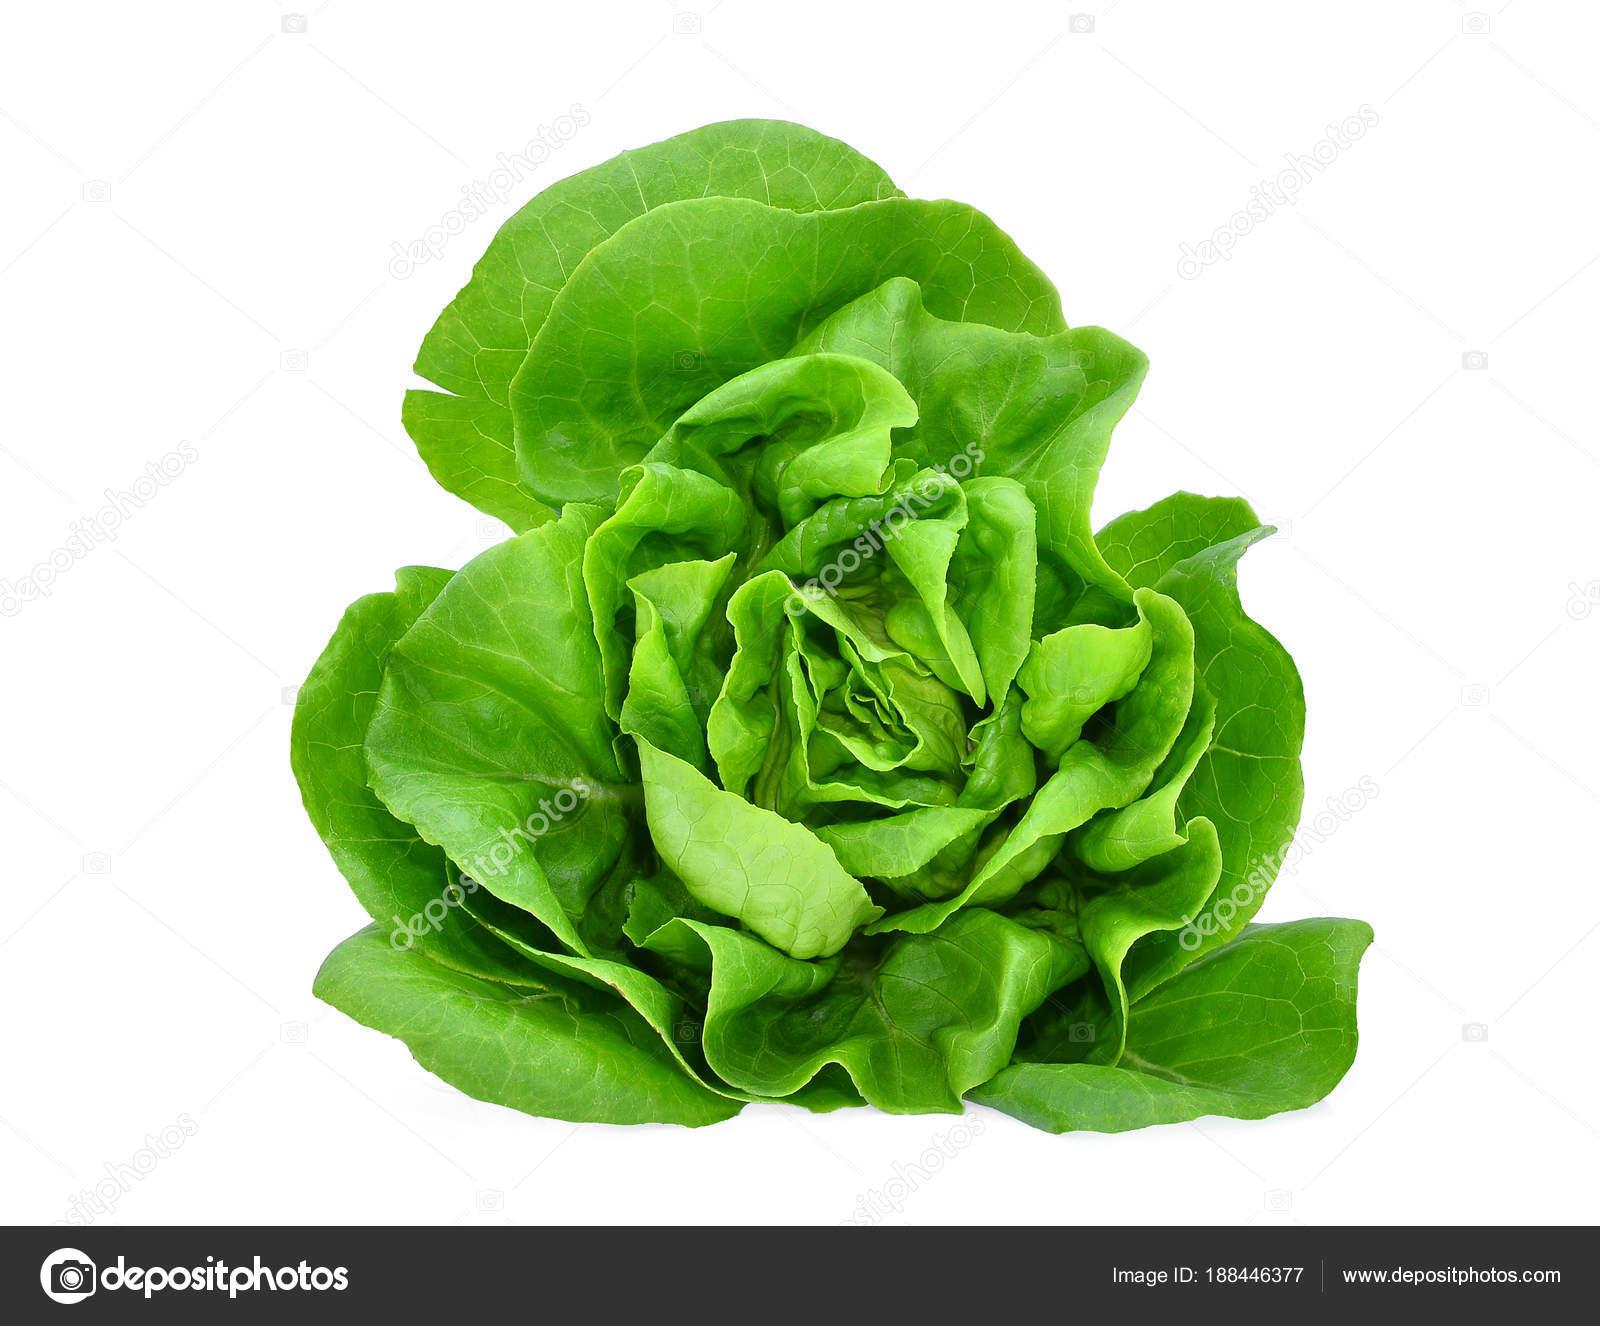 Green Butter Lettuce Vegetable Or Salad Isolated On White Back G